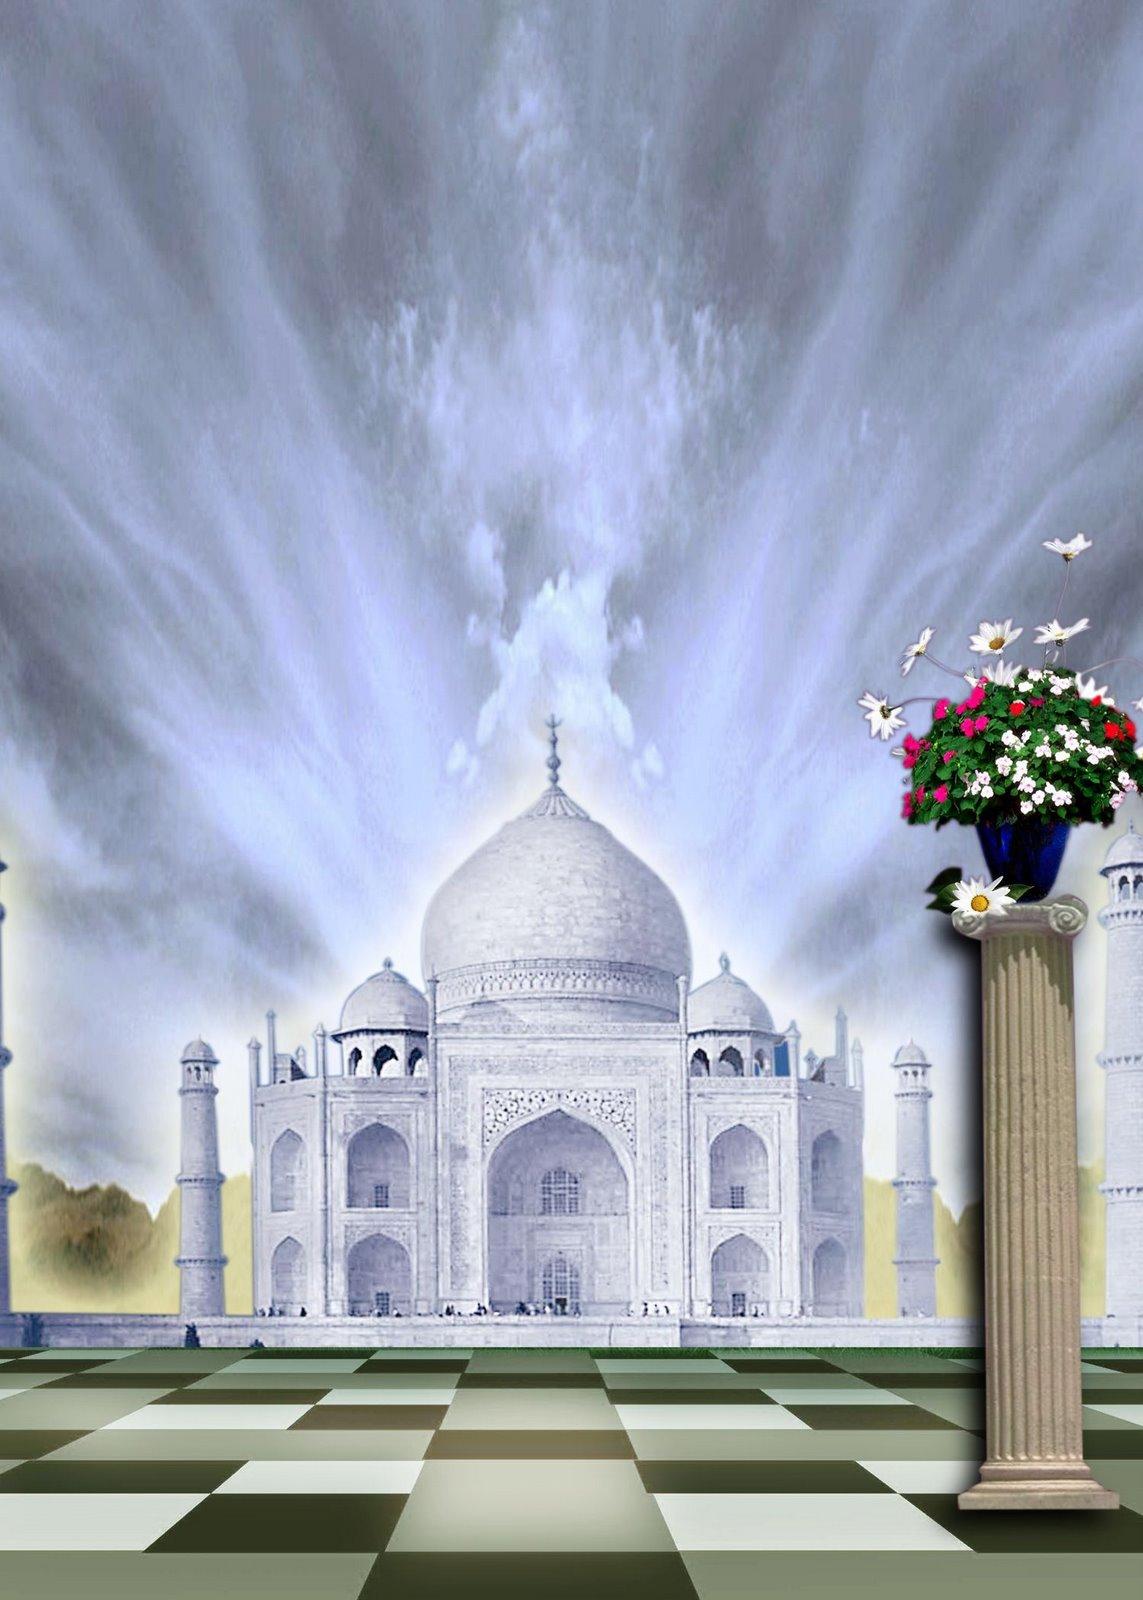 Studio Photoshop Backgrounds Free Download